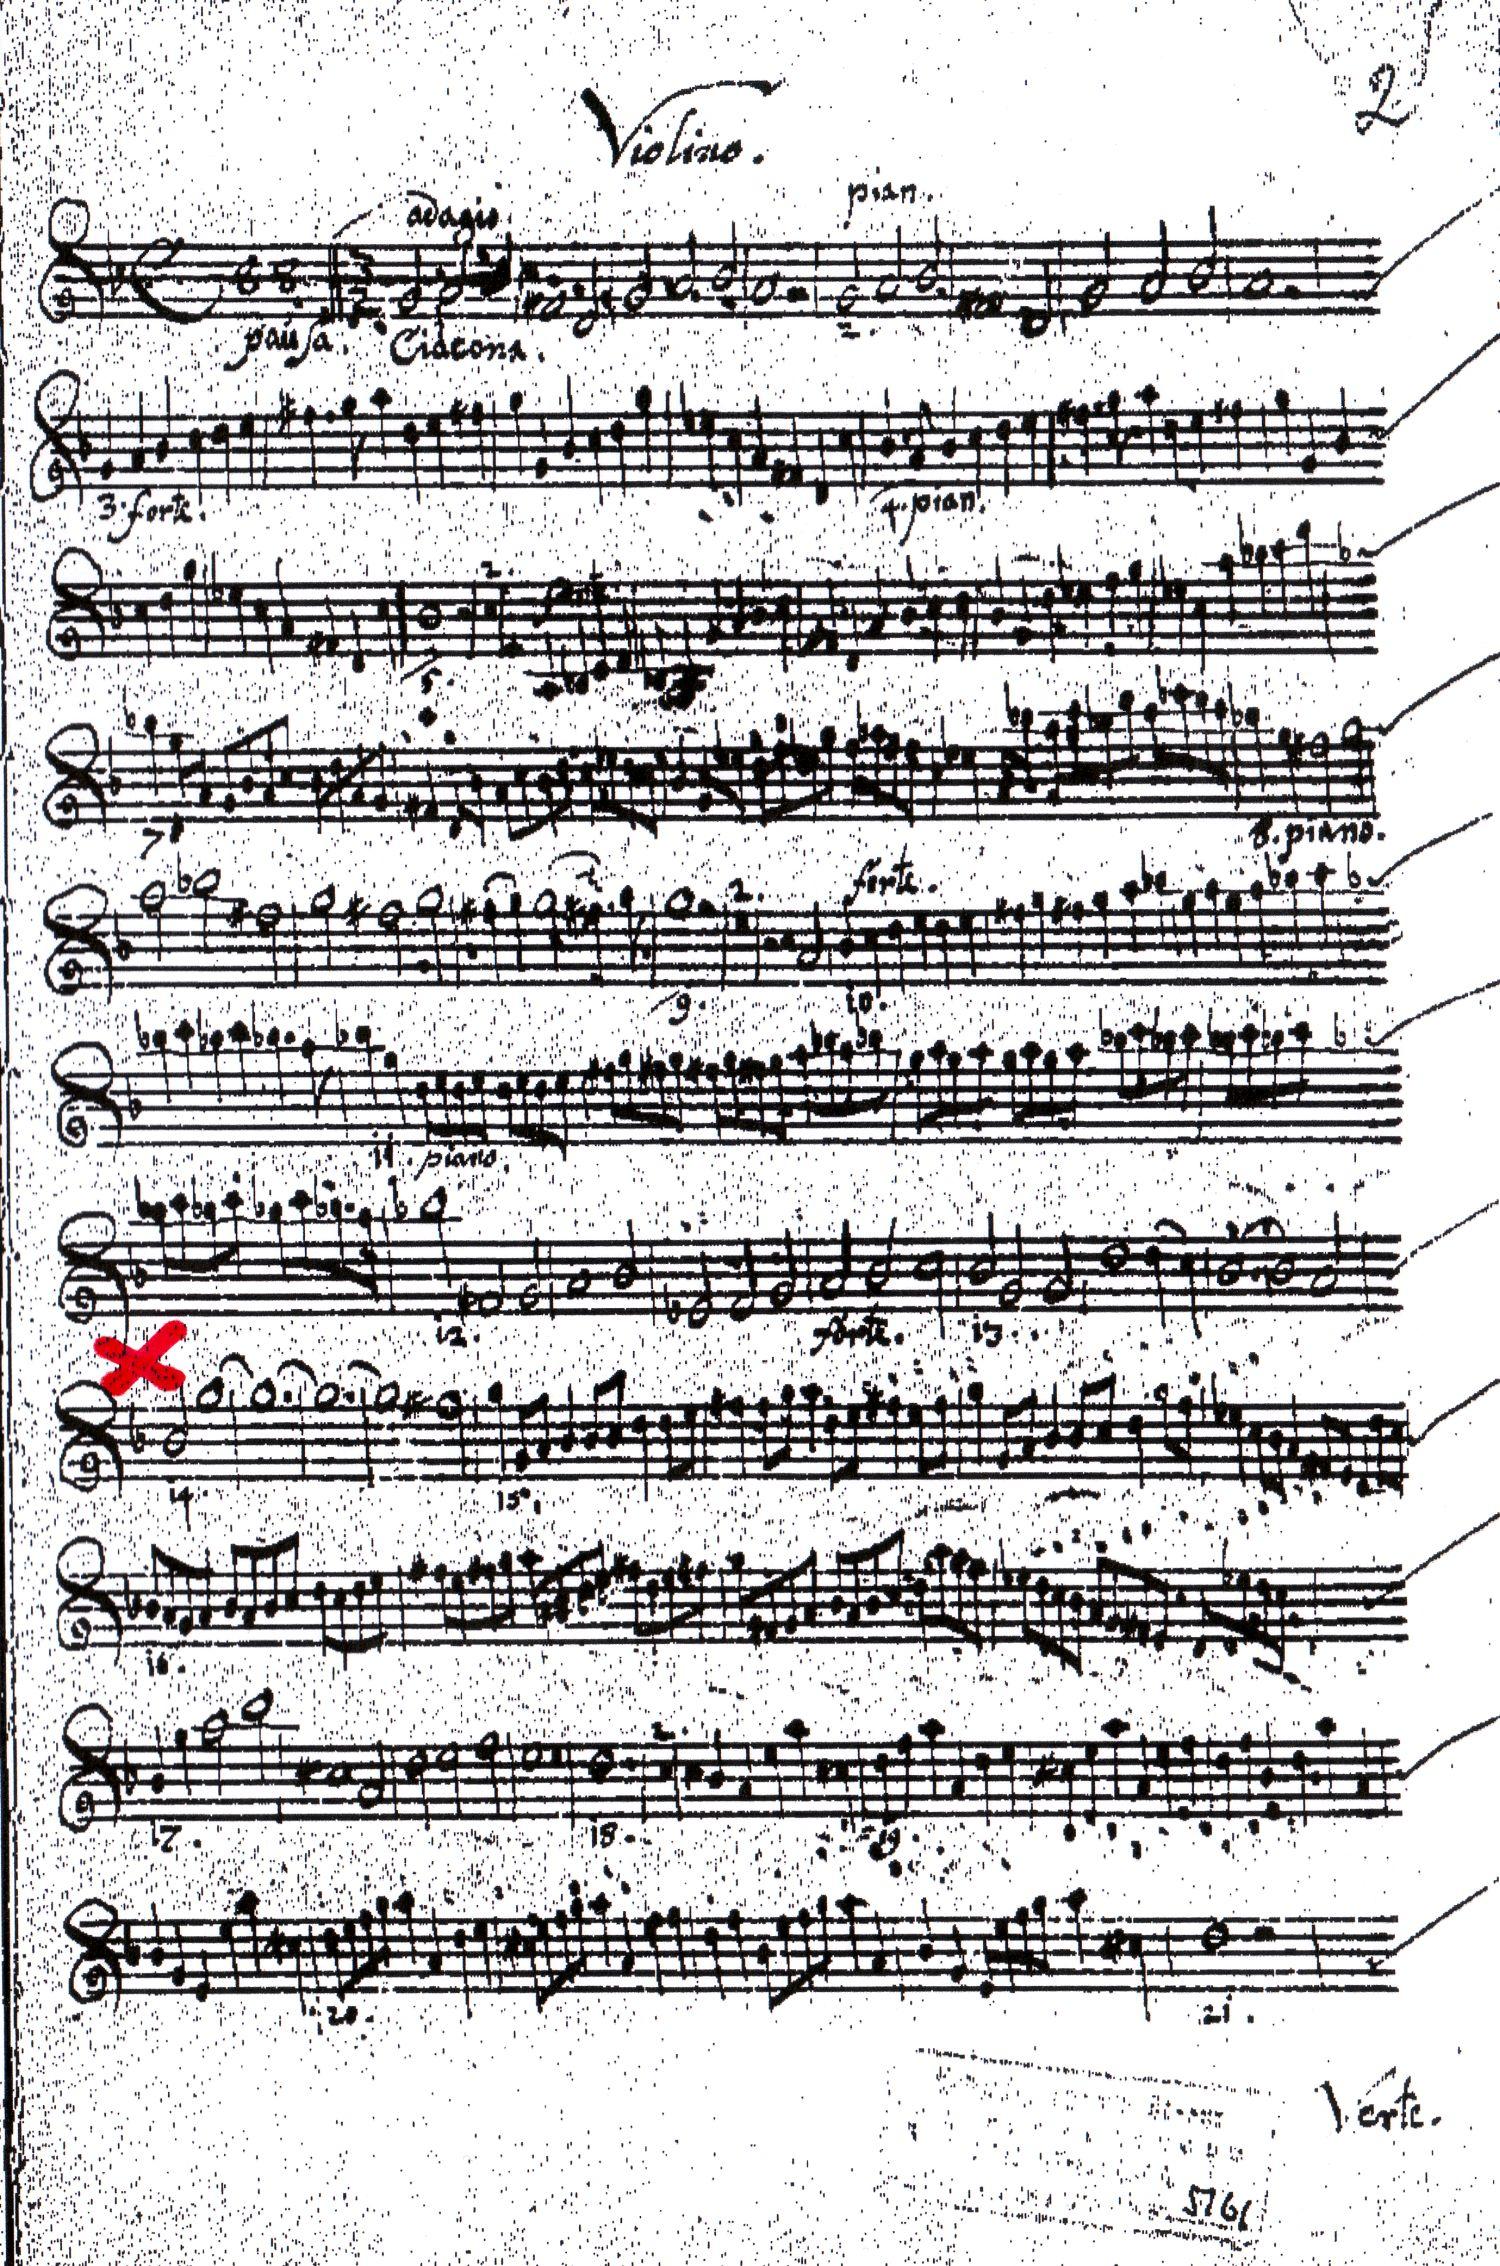 piccolos mit eigenem etikett